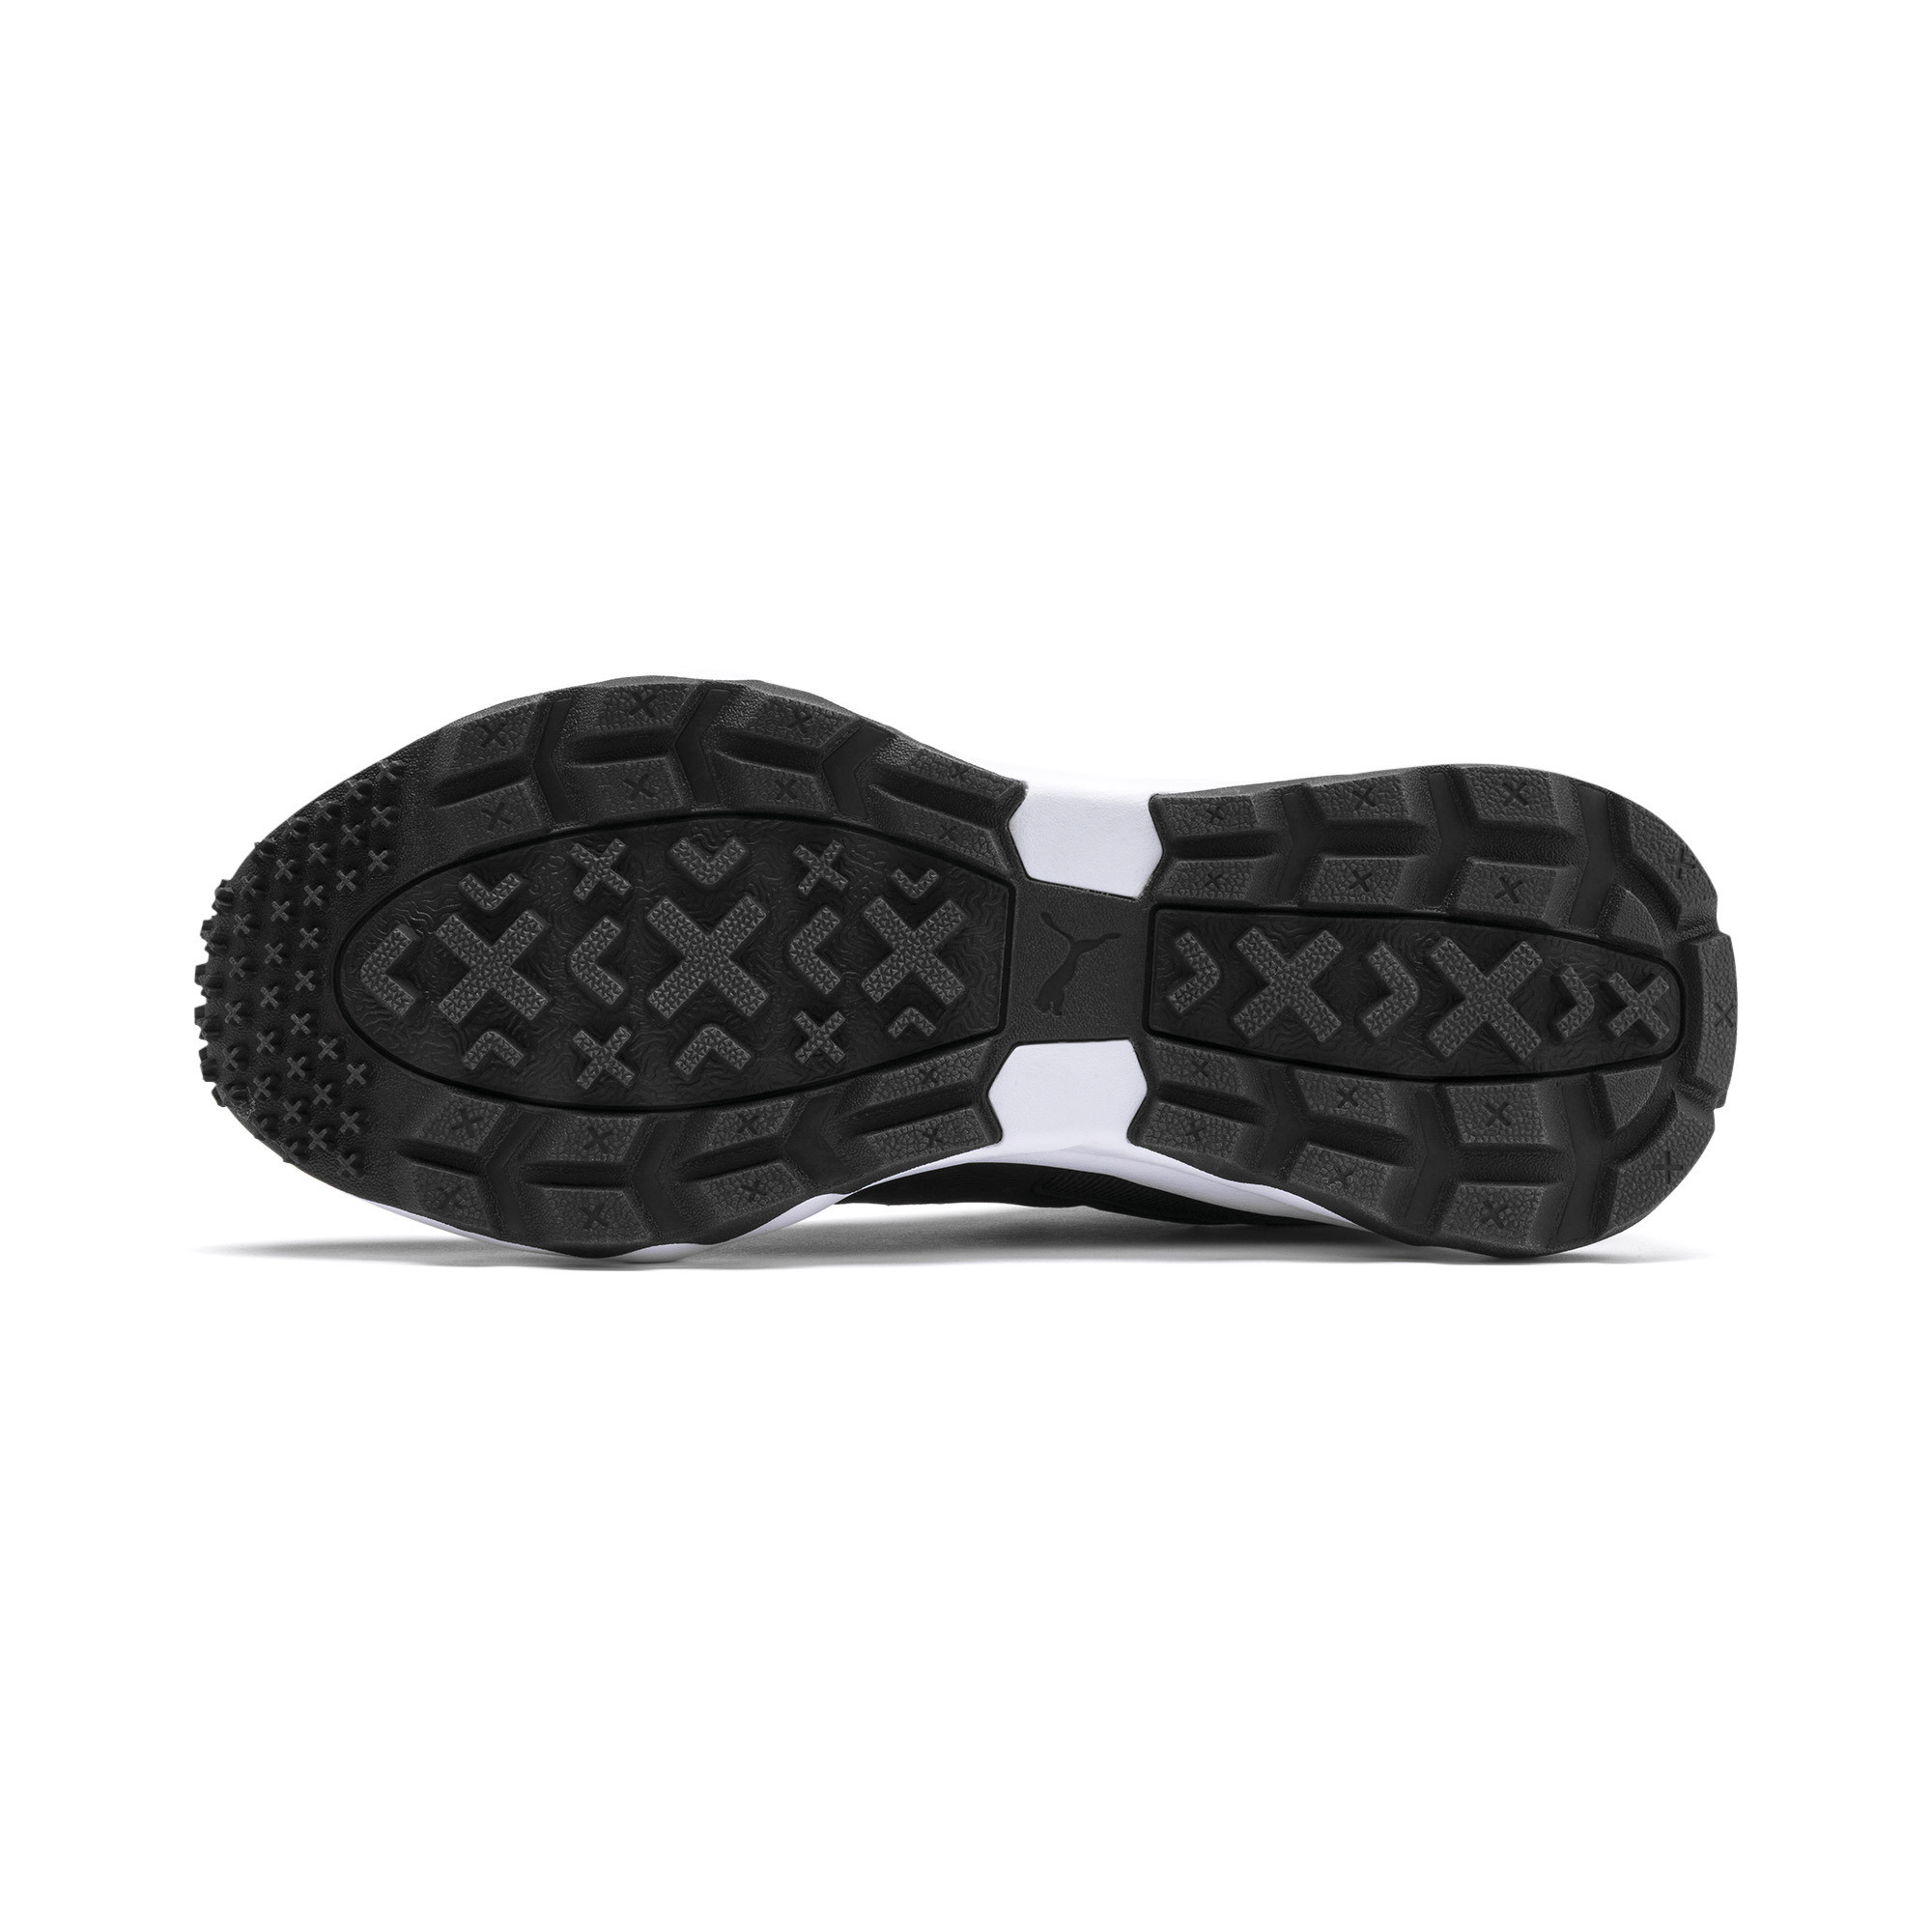 PUMA-Ember-Trail-Men-s-Running-Shoes-Men-Shoe-Running thumbnail 21